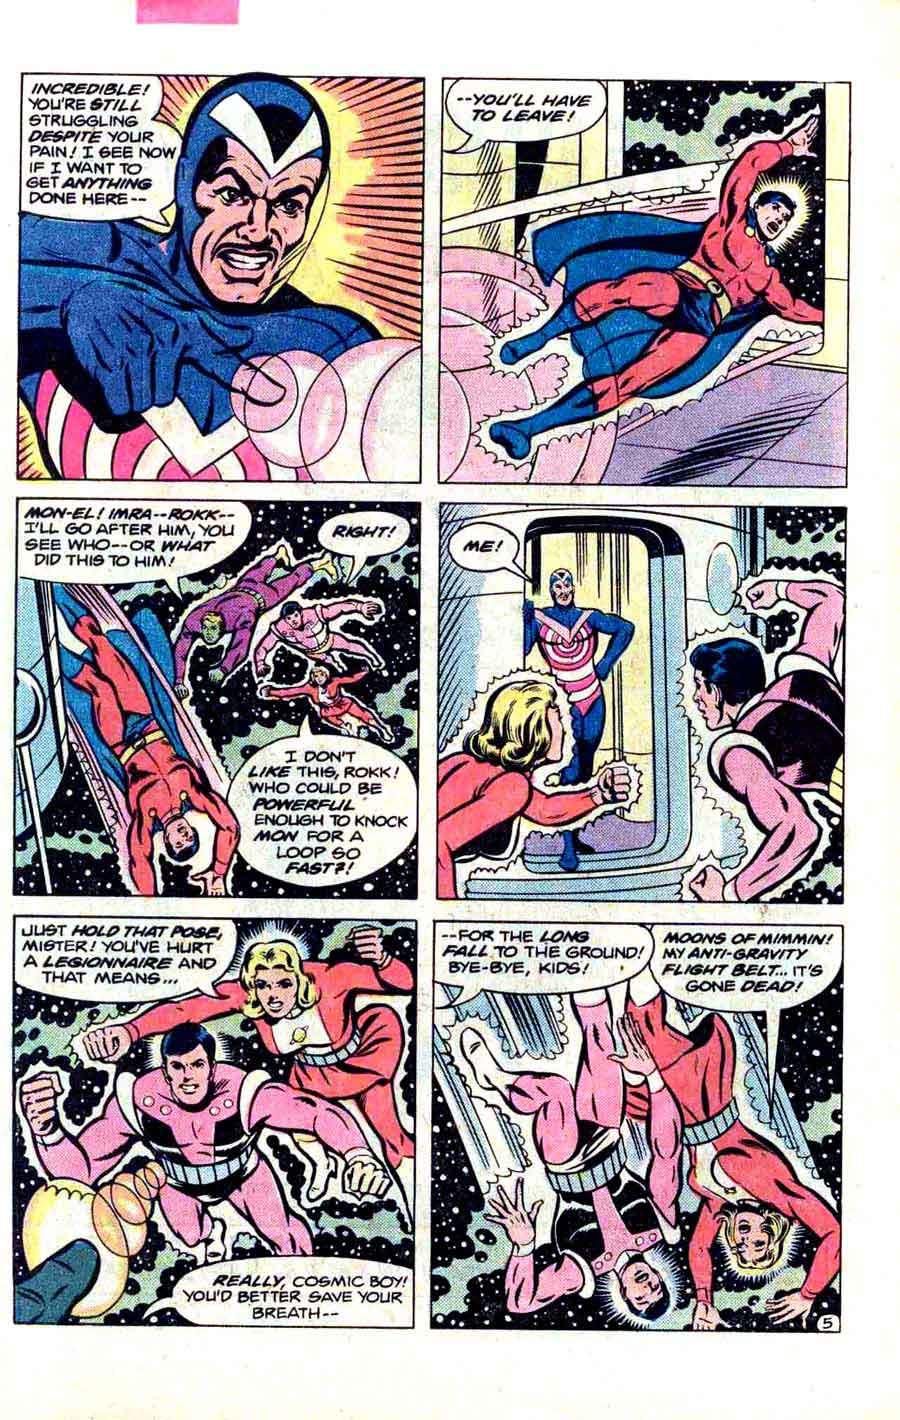 Legion of Super-Heroes v2 #267 - Steve Ditko dc 1980s comic book page art